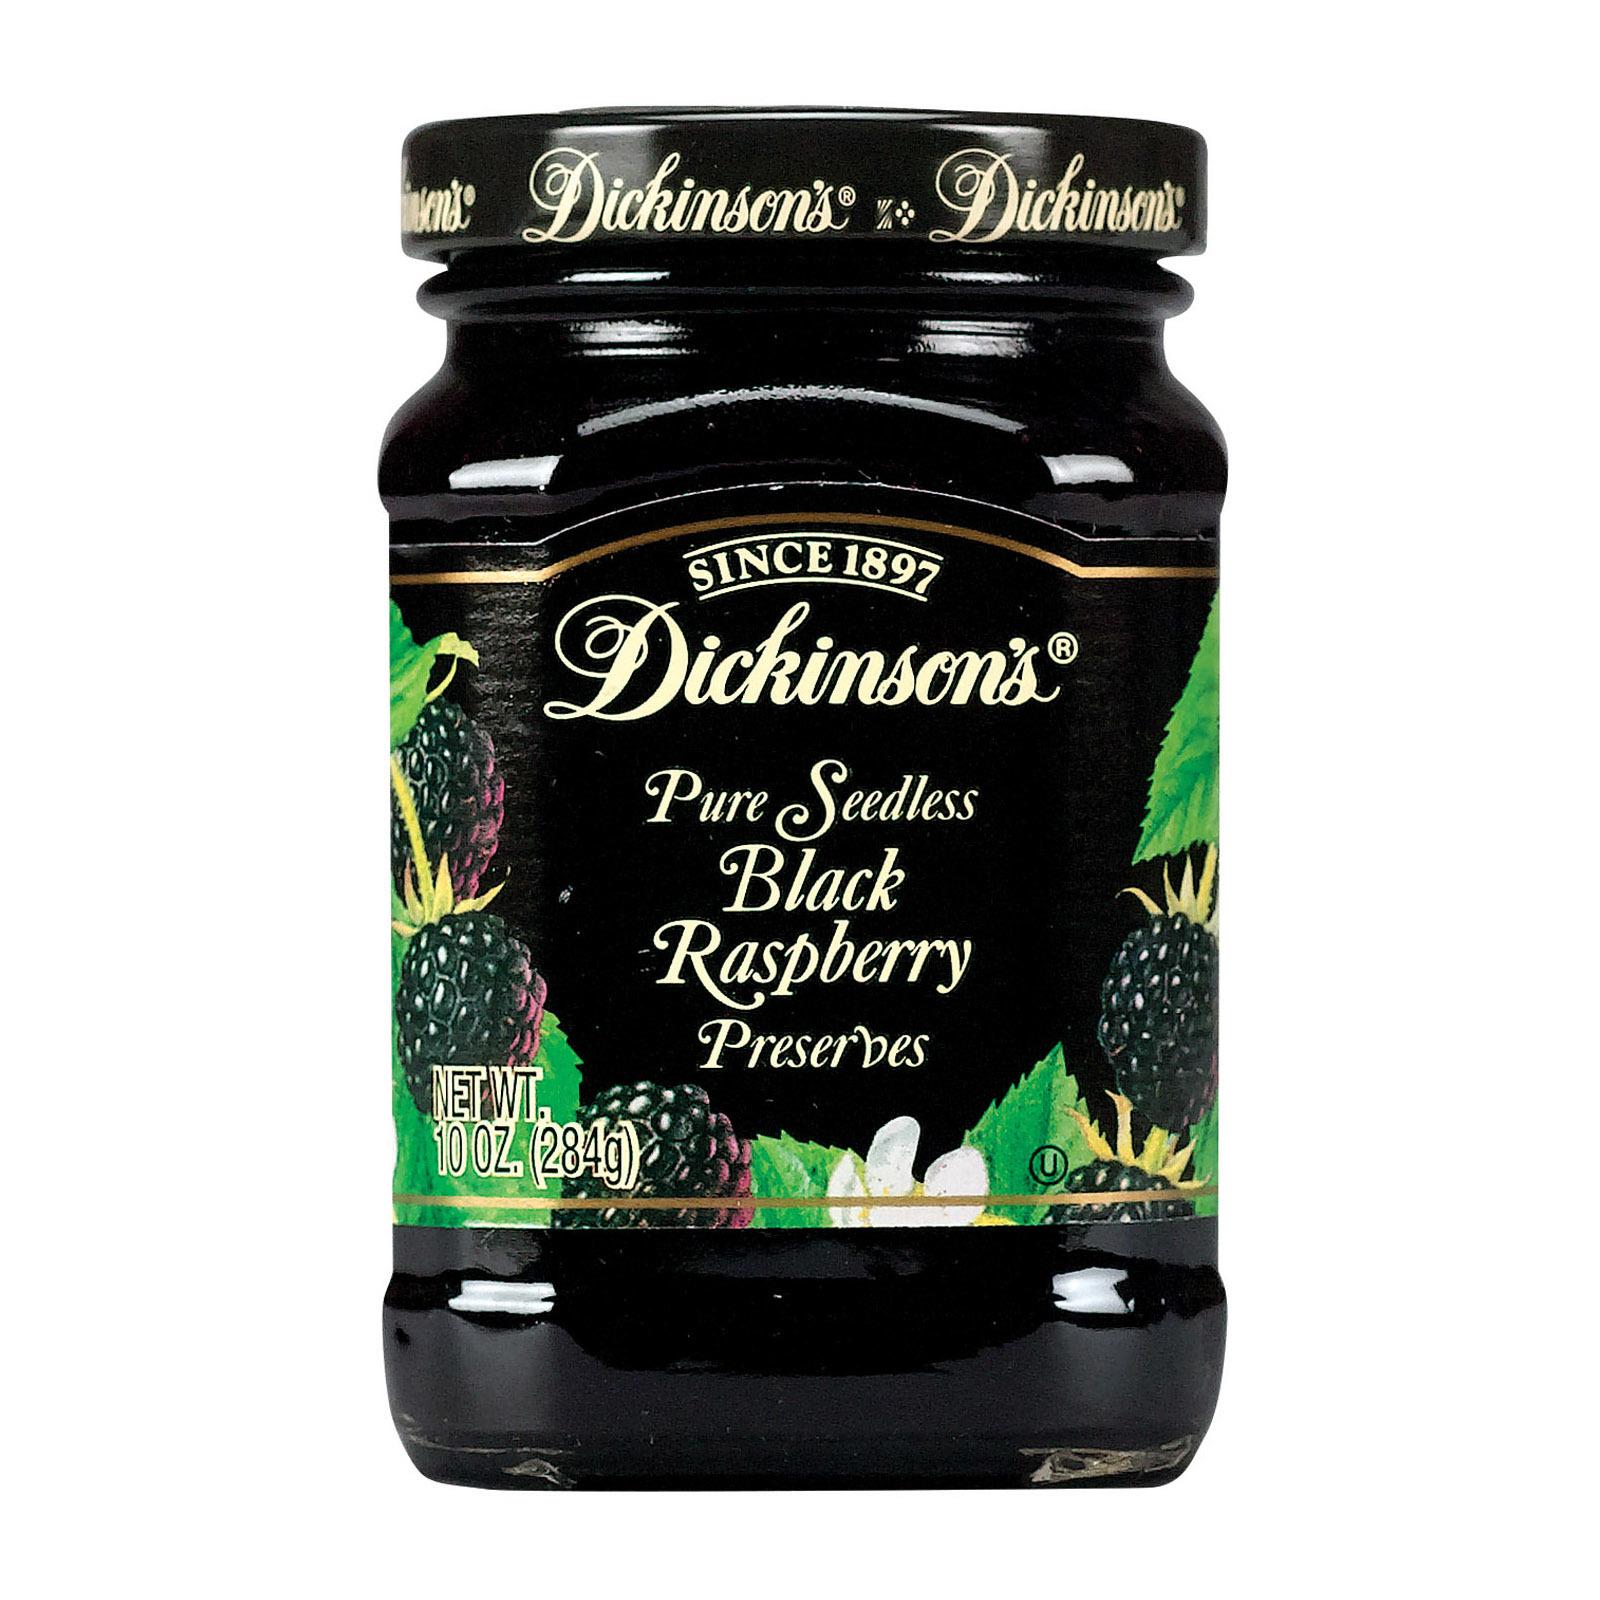 Dickinson Seedless Black Raspberry Preserves - Case of 6 - 10 oz